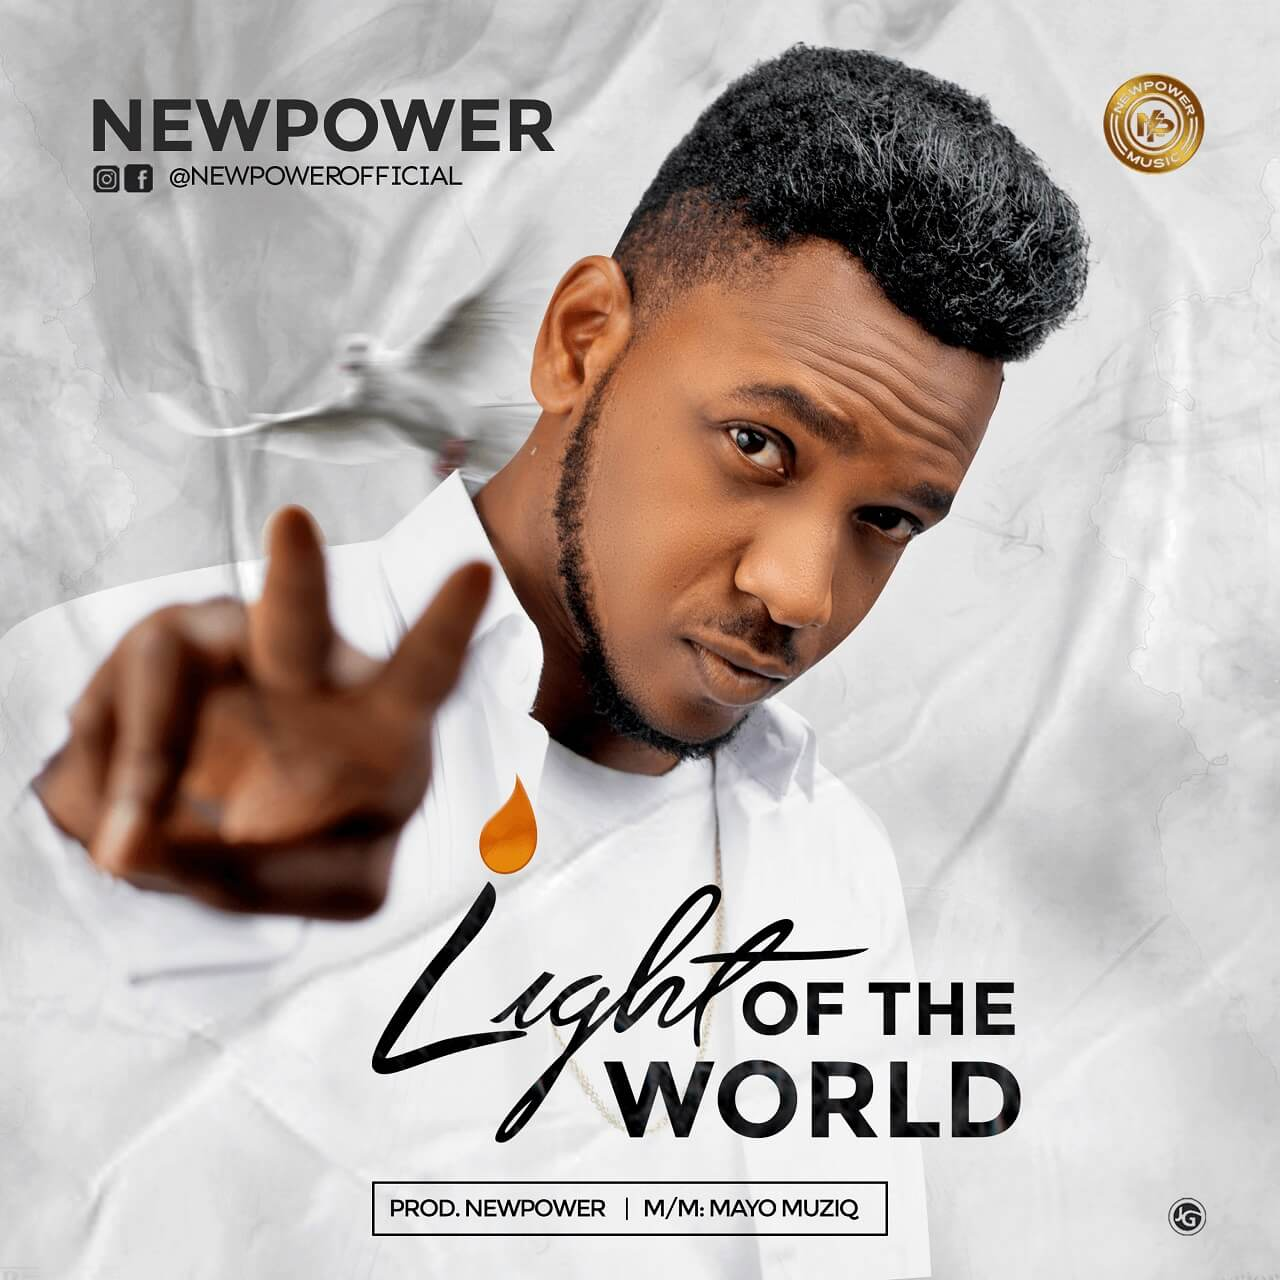 Download Mp3: Newpower - Light Of The World